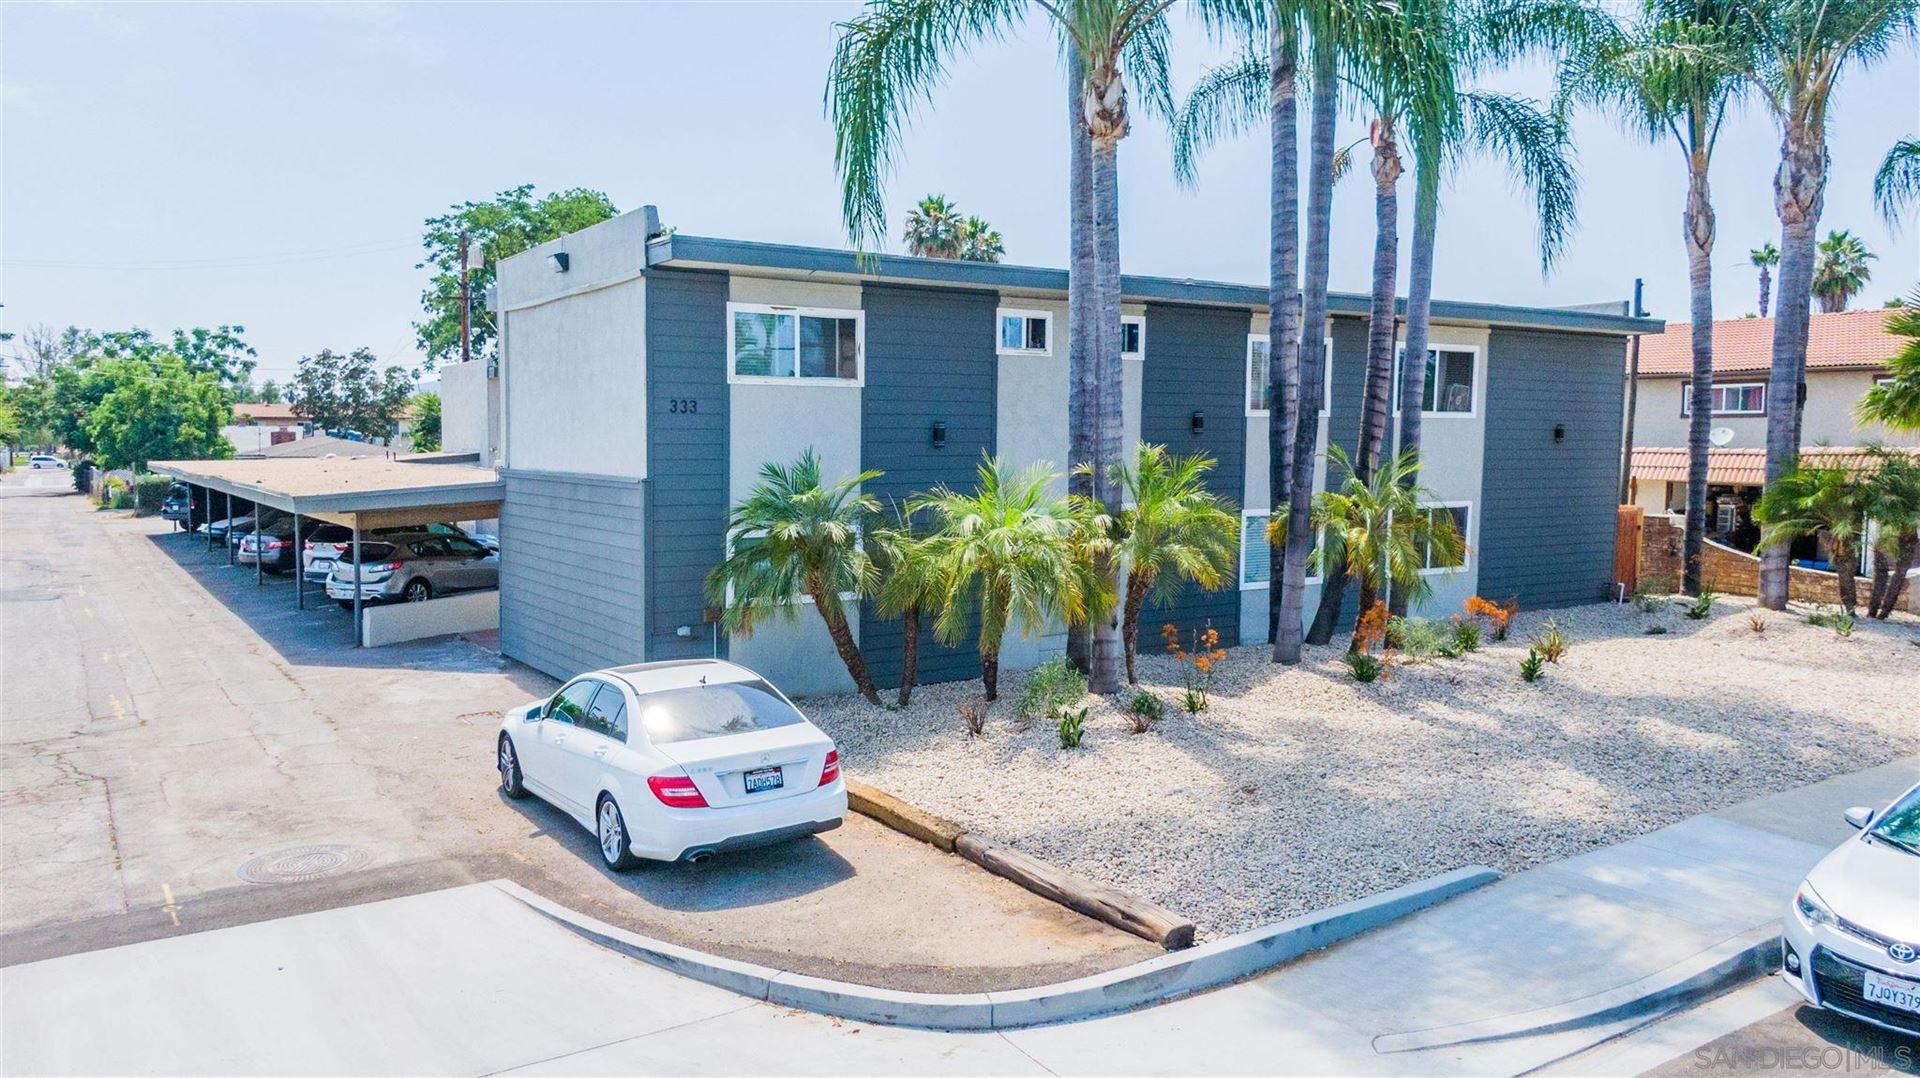 Photo of 333 N Juniper Street, Escondido, CA 92025 (MLS # 210020072)